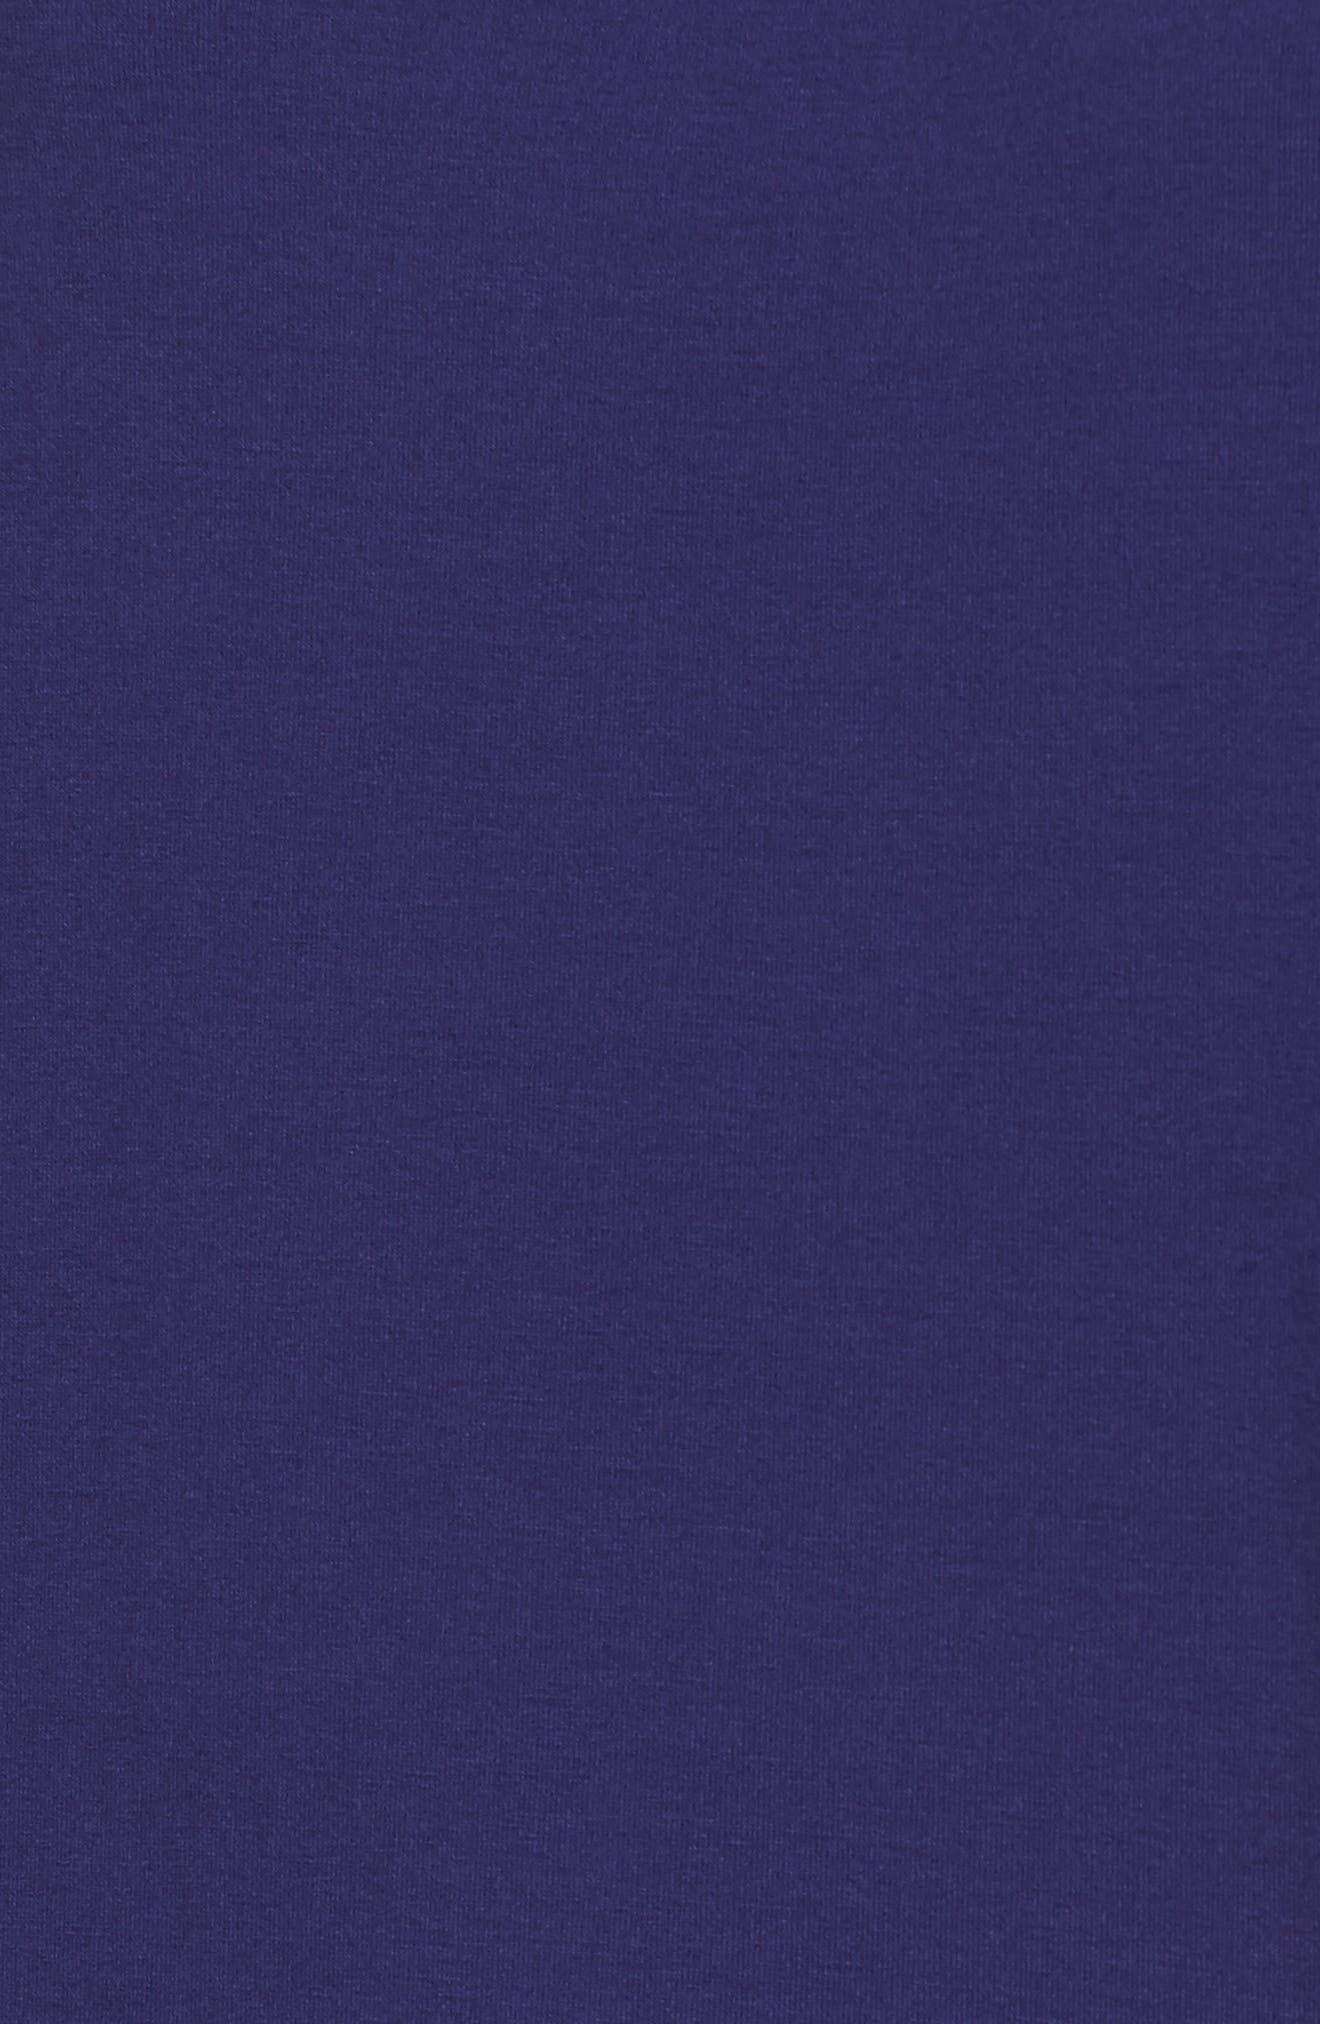 Jersey Ballet Neck Shift Dress,                             Alternate thumbnail 5, color,                             Ultramarine